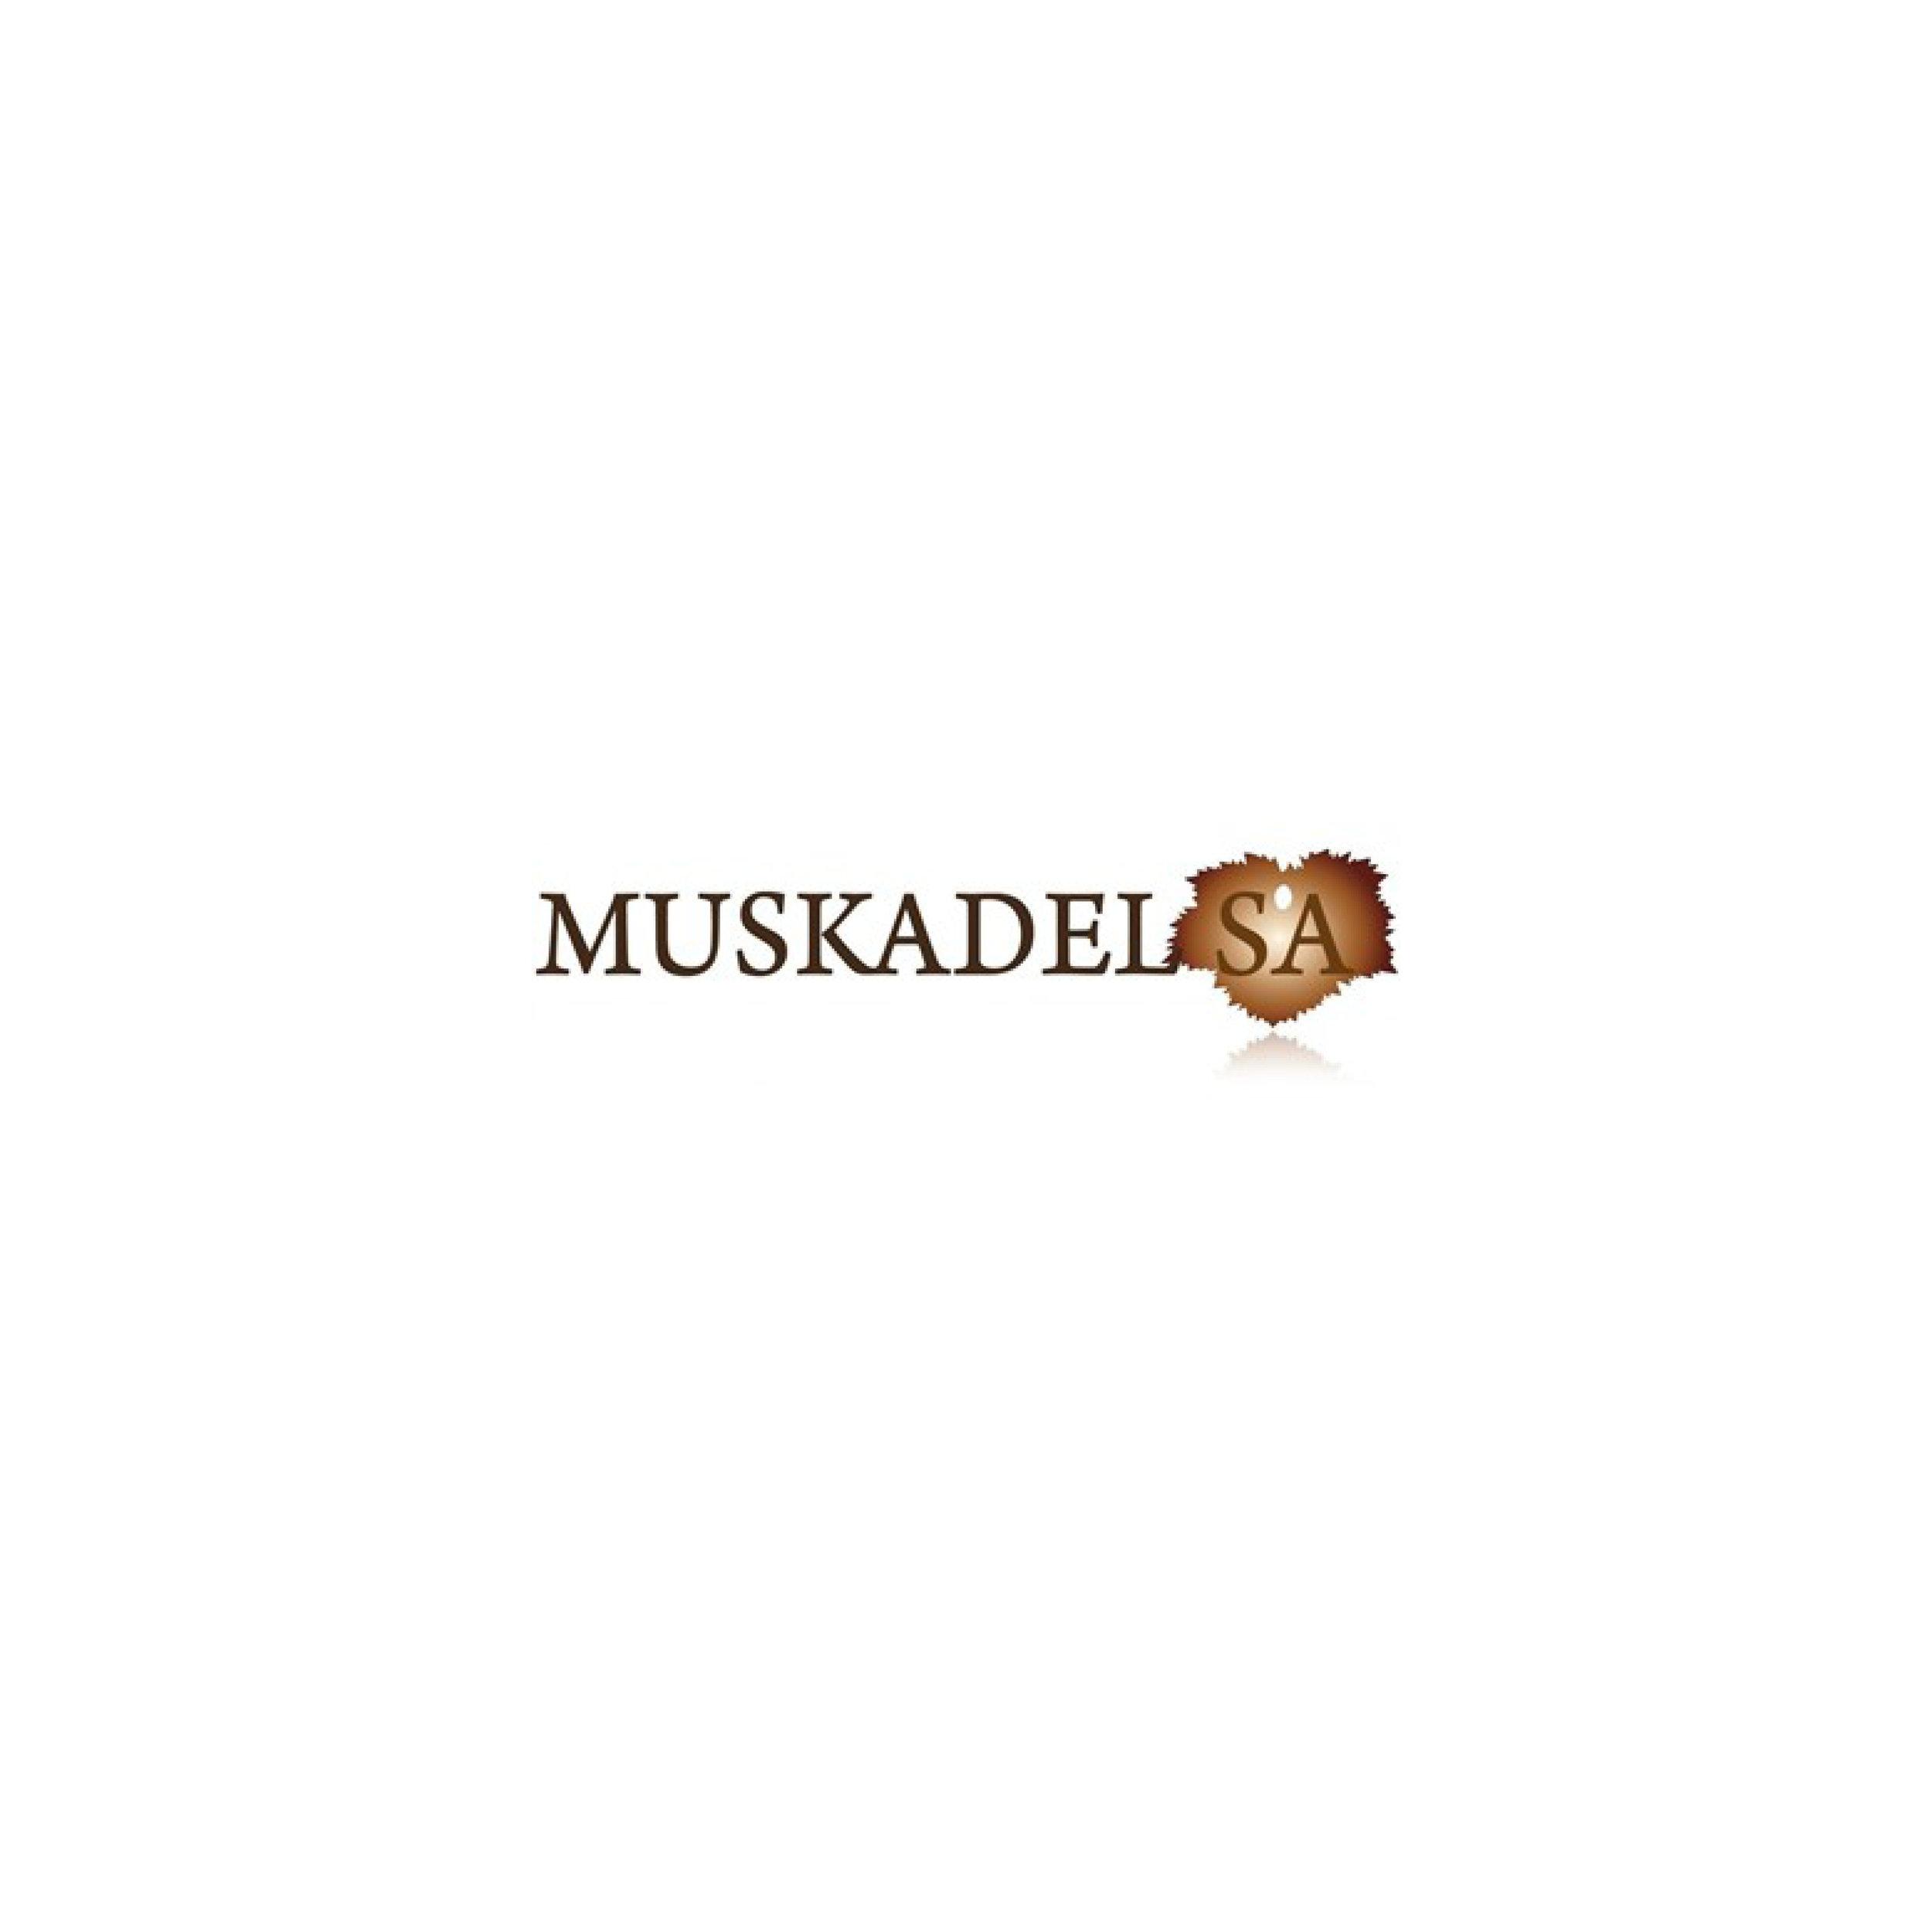 MuskadelSA.jpg